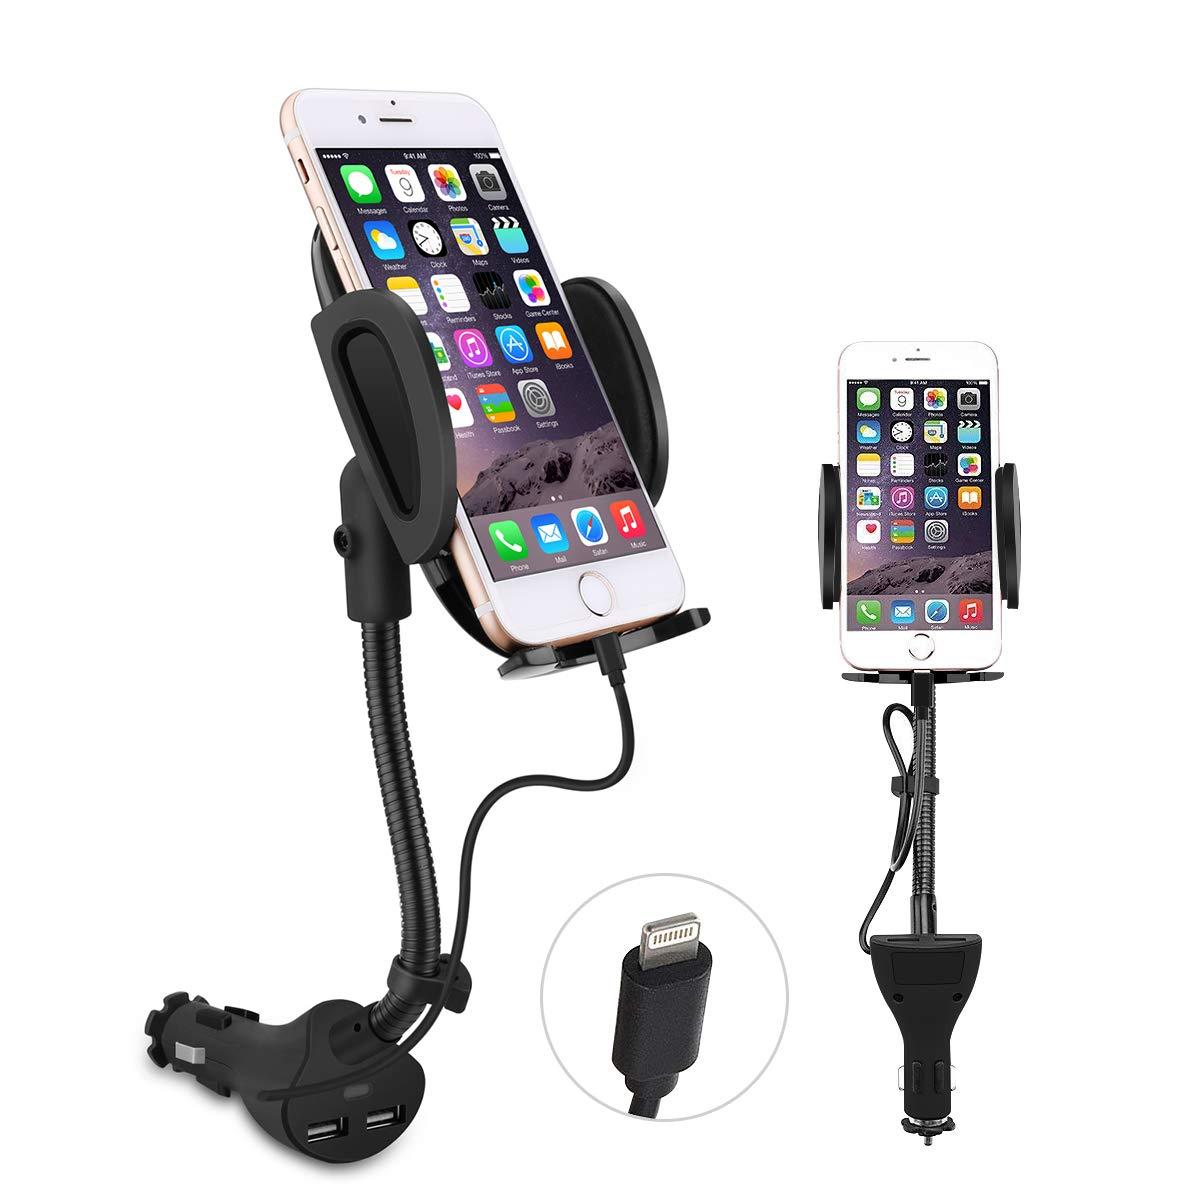 Te-Rich - Cargador de Coche para teléfono móvil (Puerto USB Doble, 3,1 A) con Cable de Carga Integrado para Smartphones: Amazon.es: Electrónica